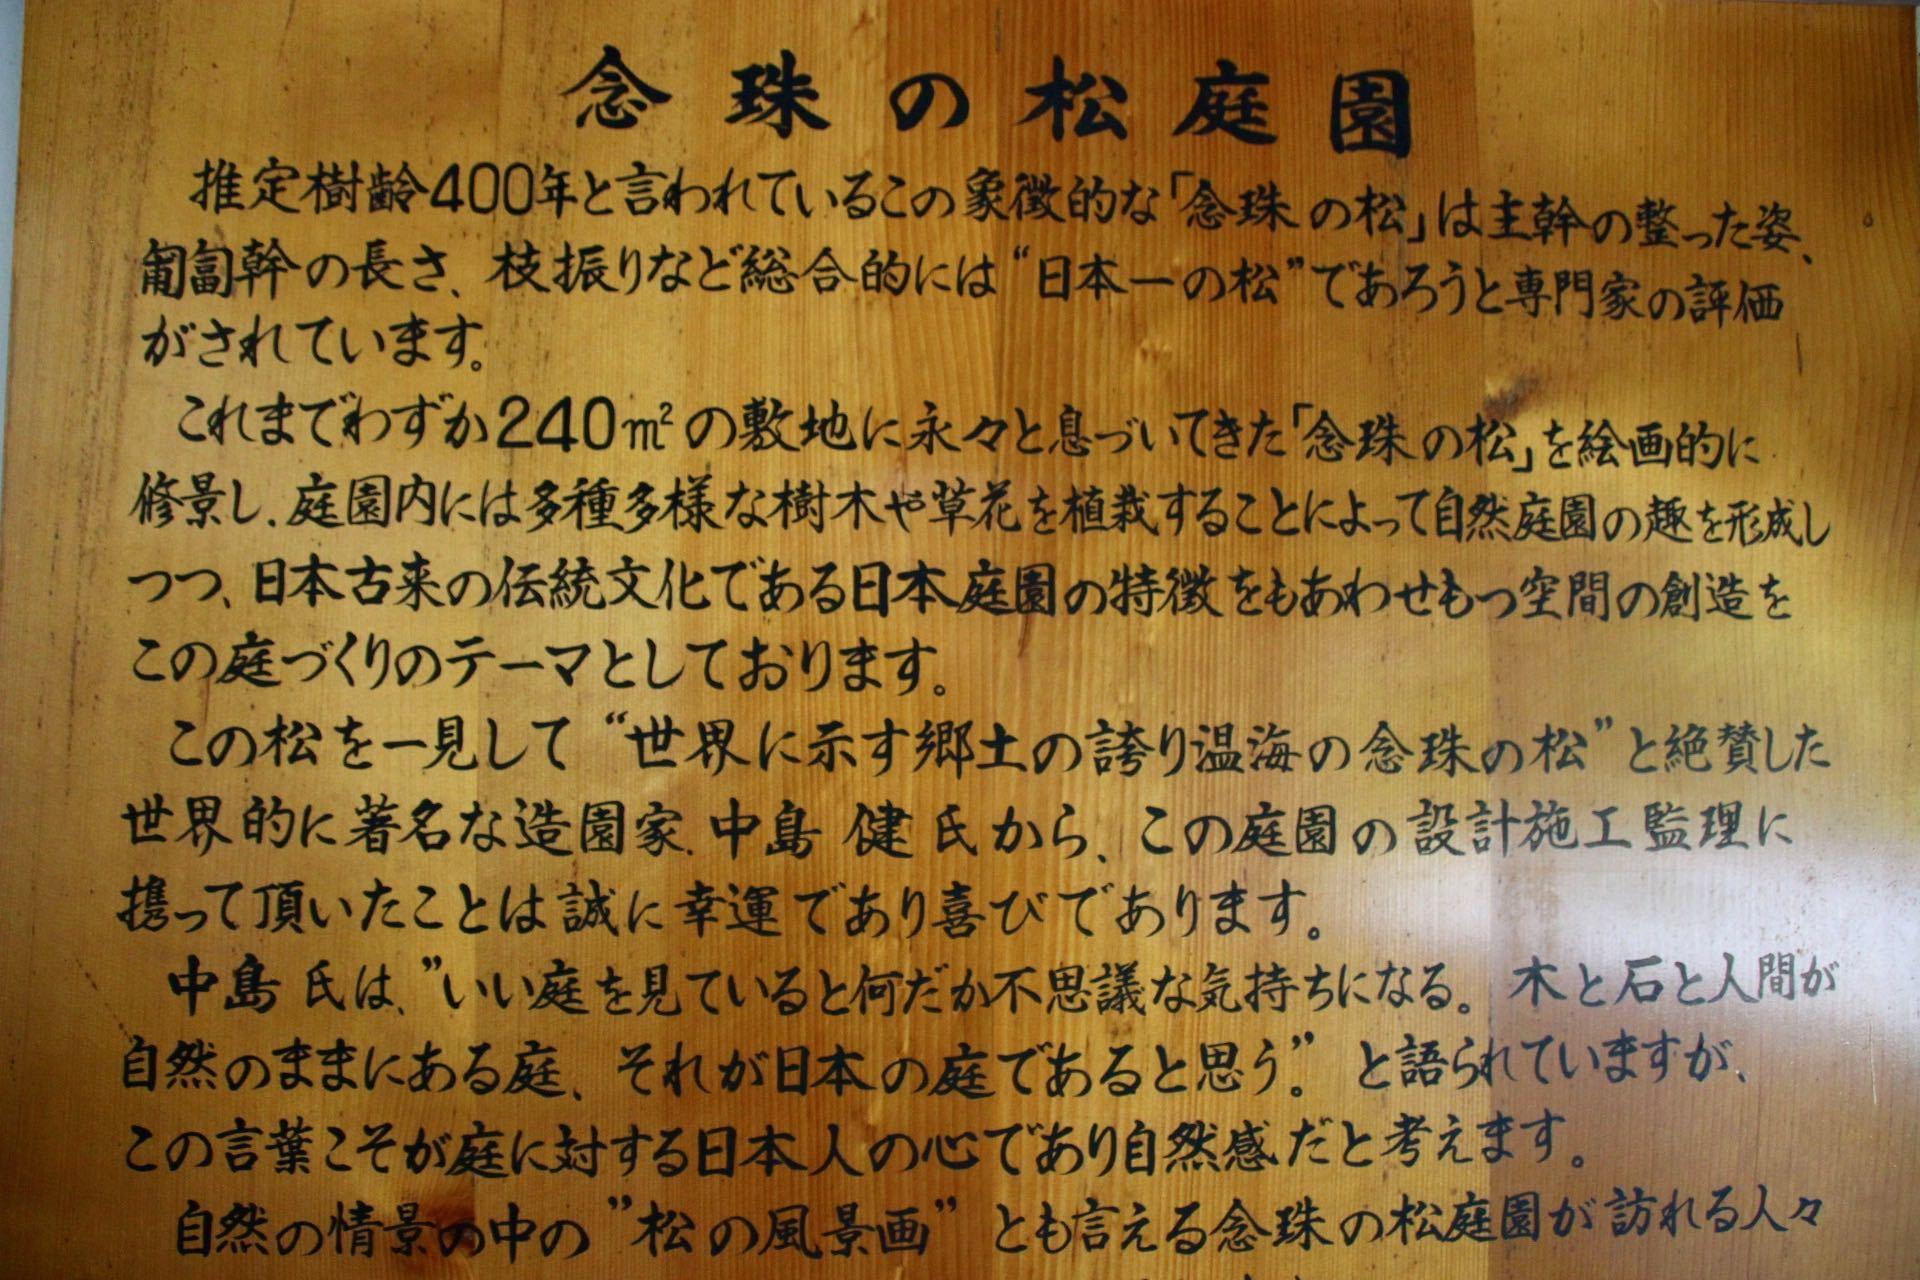 IMG_7145a.jpg